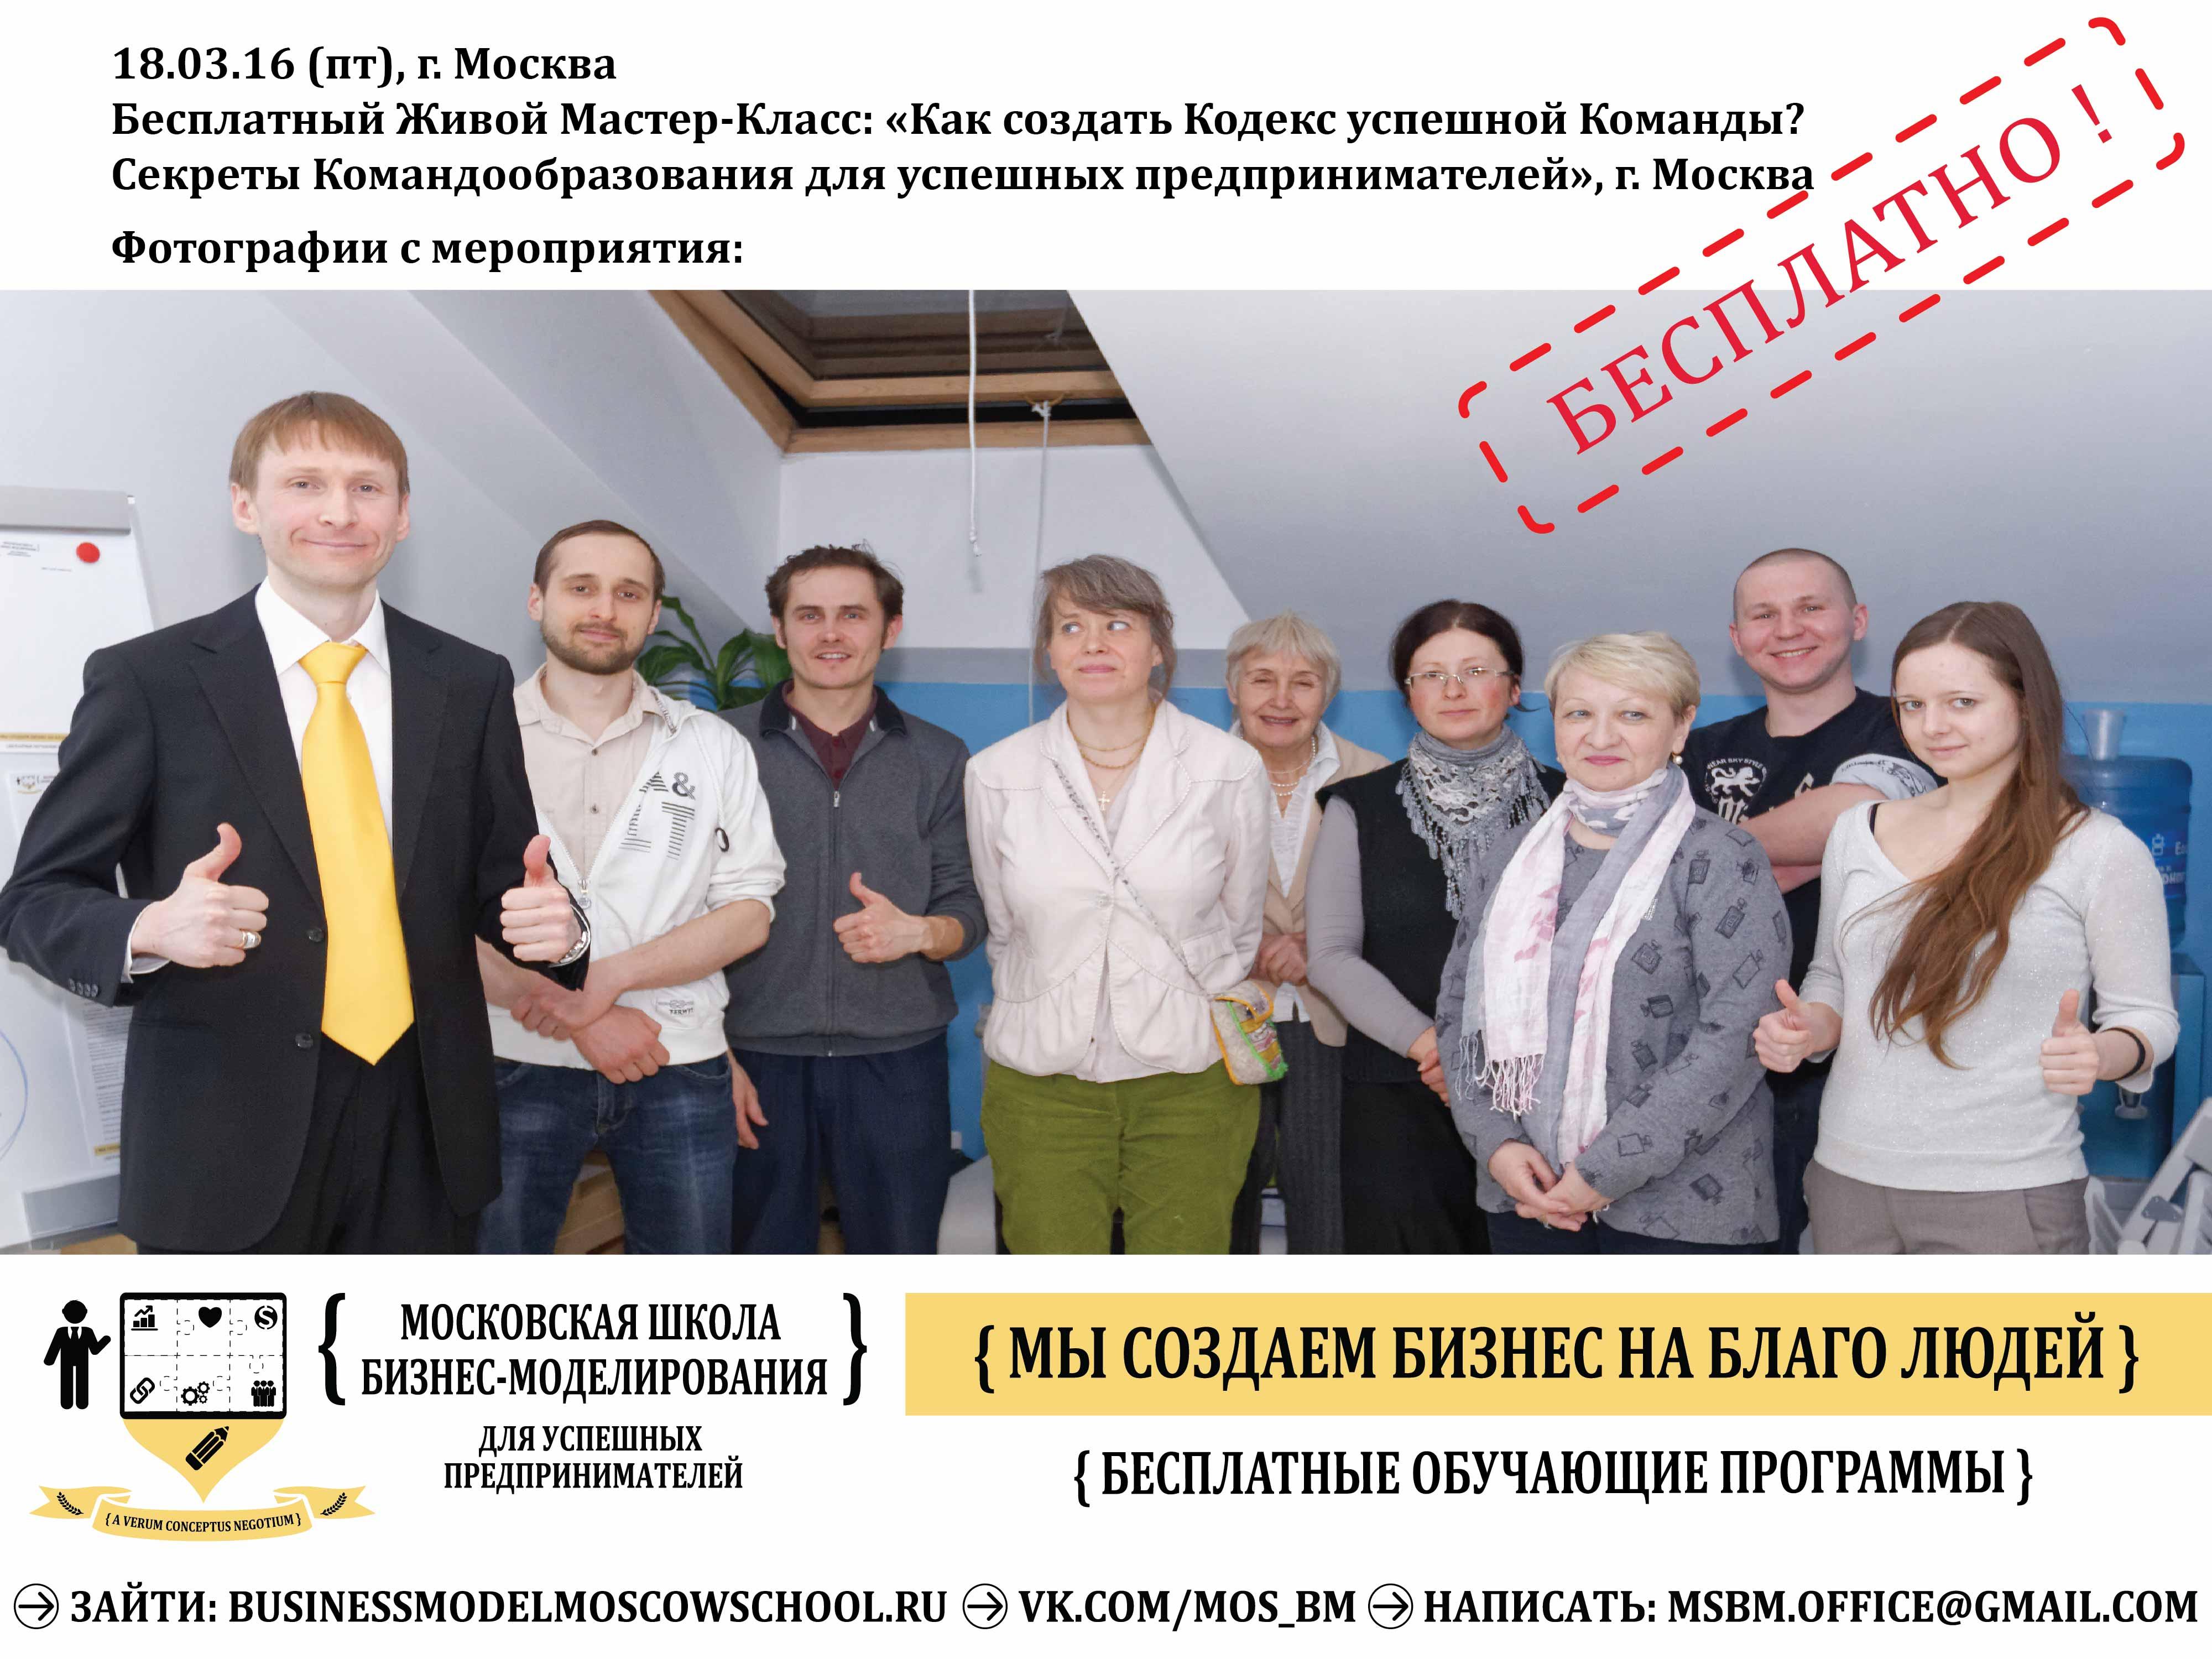 business_model_moscow_school_mclass_photo-18.03.16-4